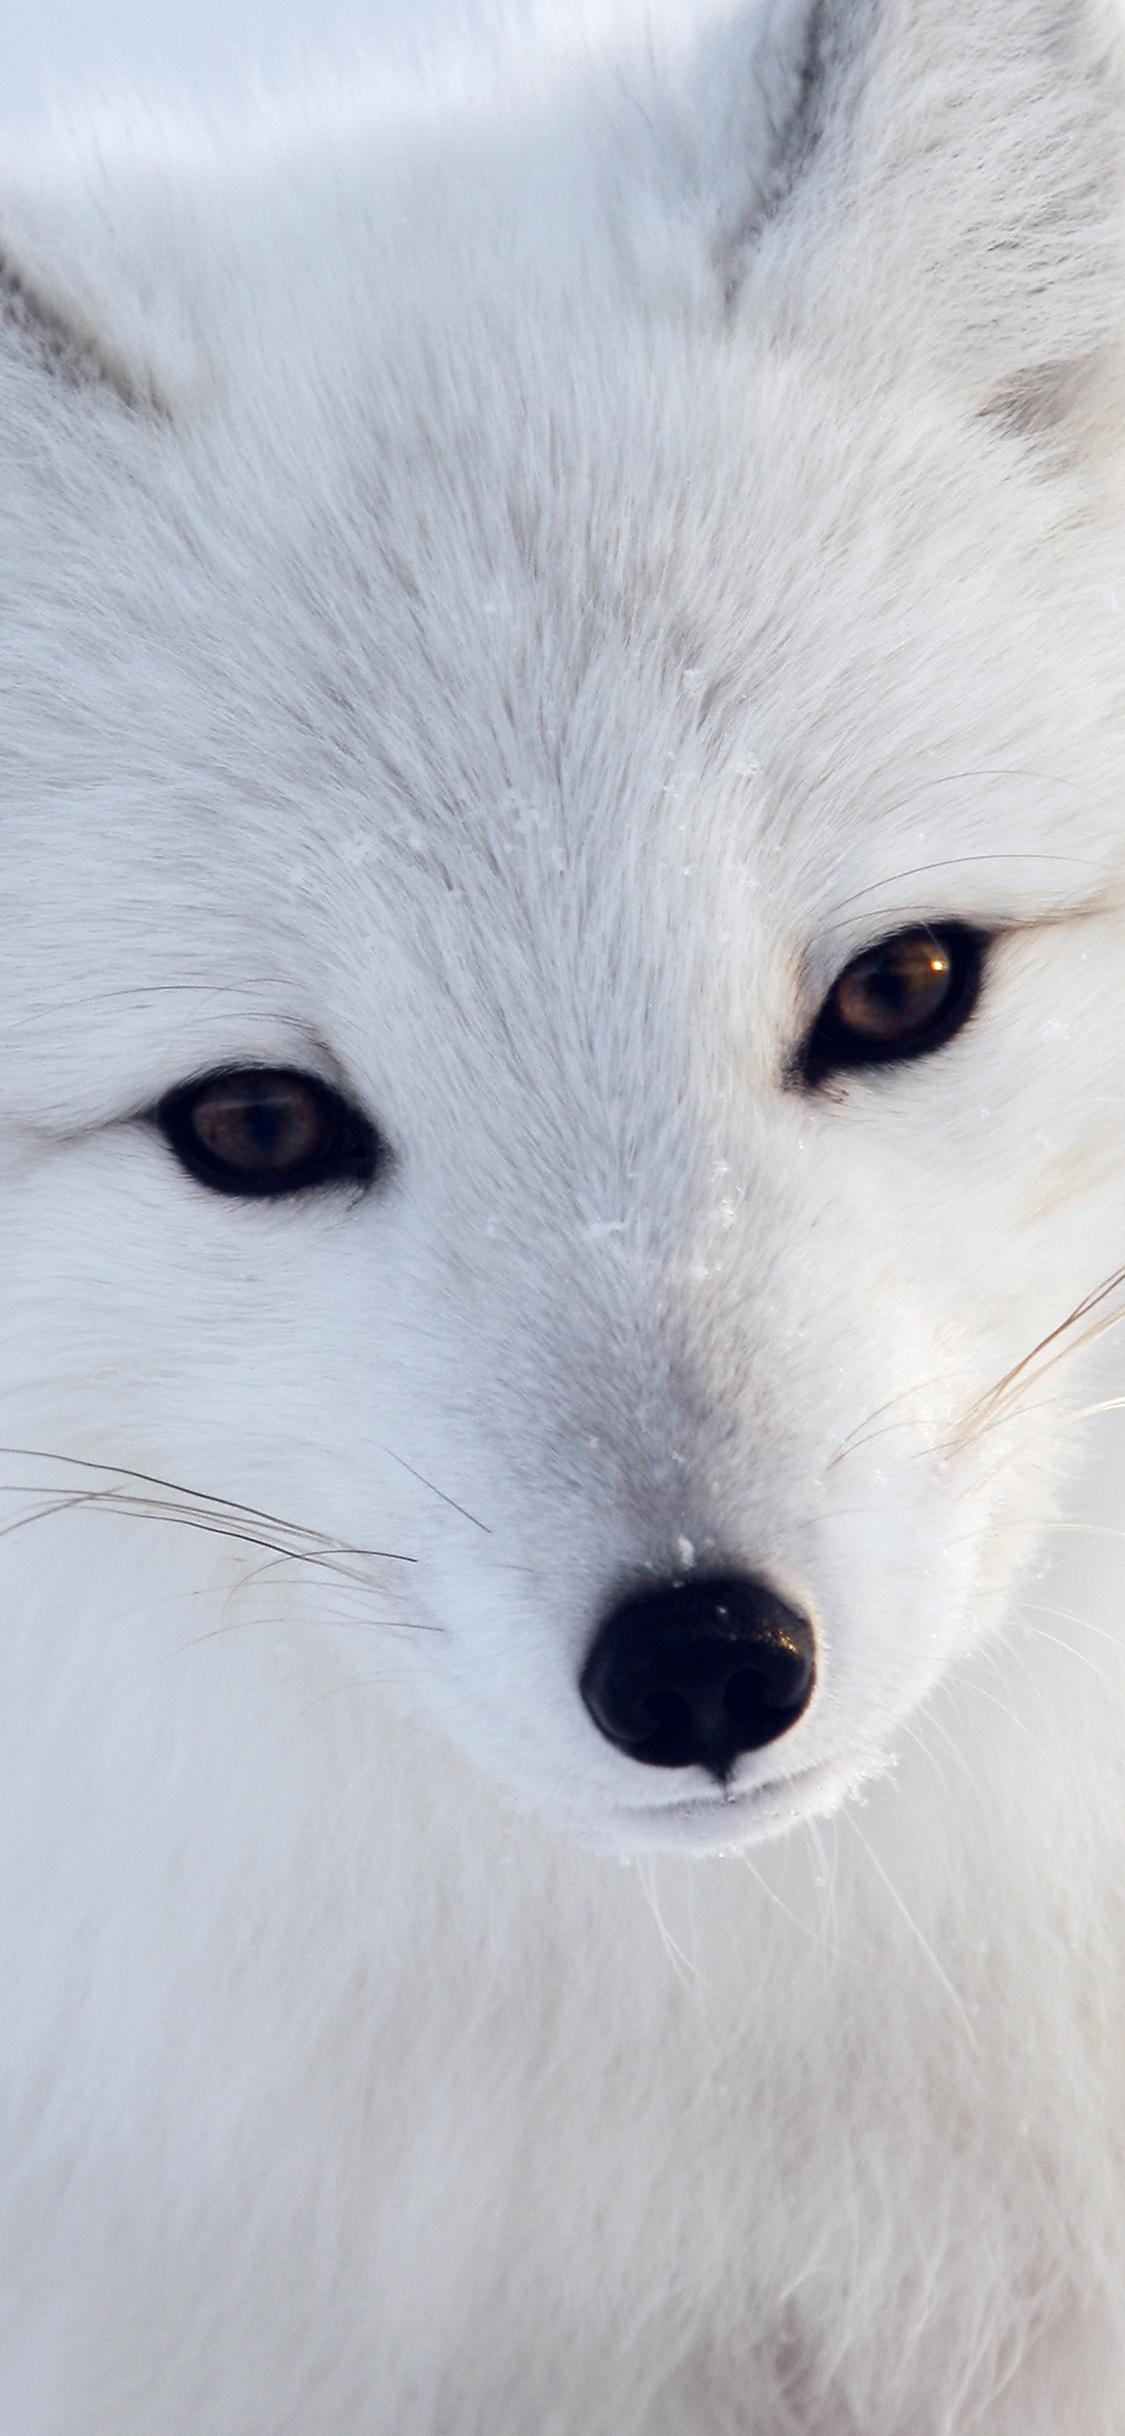 iPhoneXpapers.com-Apple-iPhone-wallpaper-mu16-artic-fox-white-animal-cute